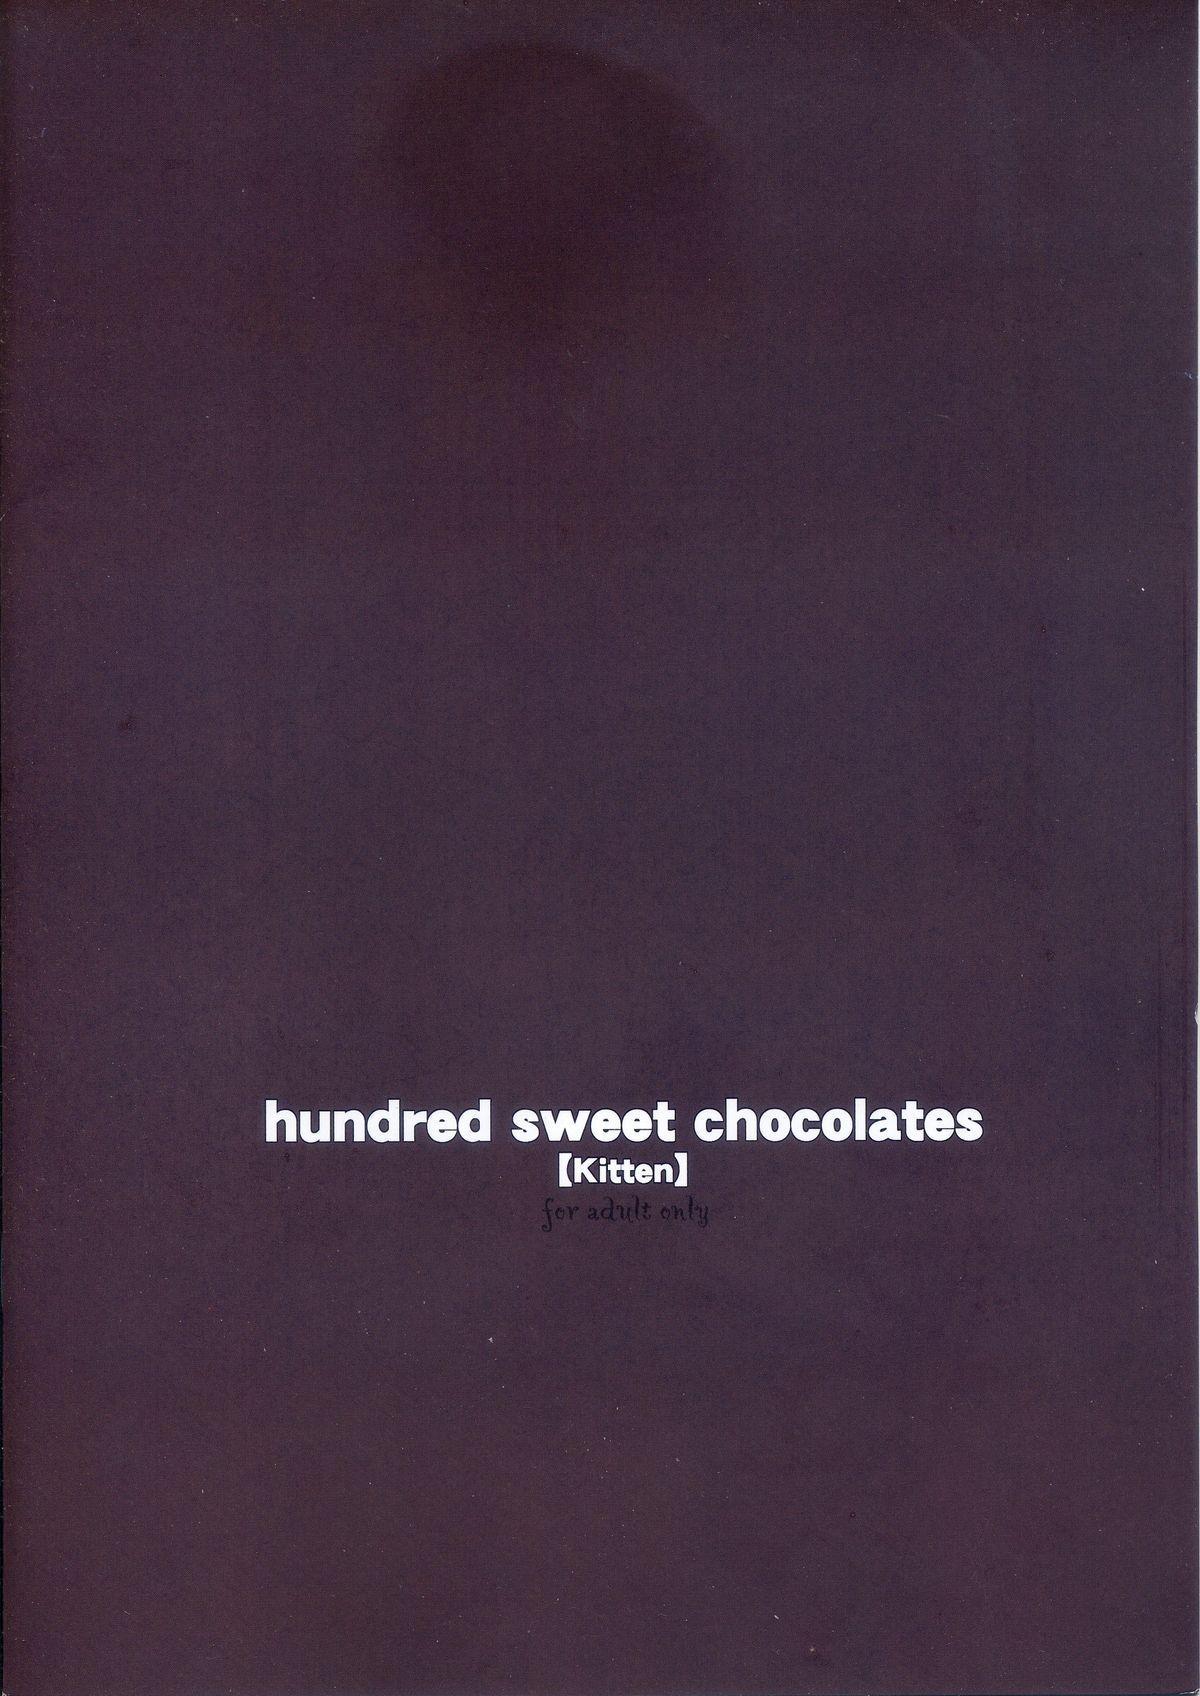 hundred sweet chocolates 【Kitten】 10